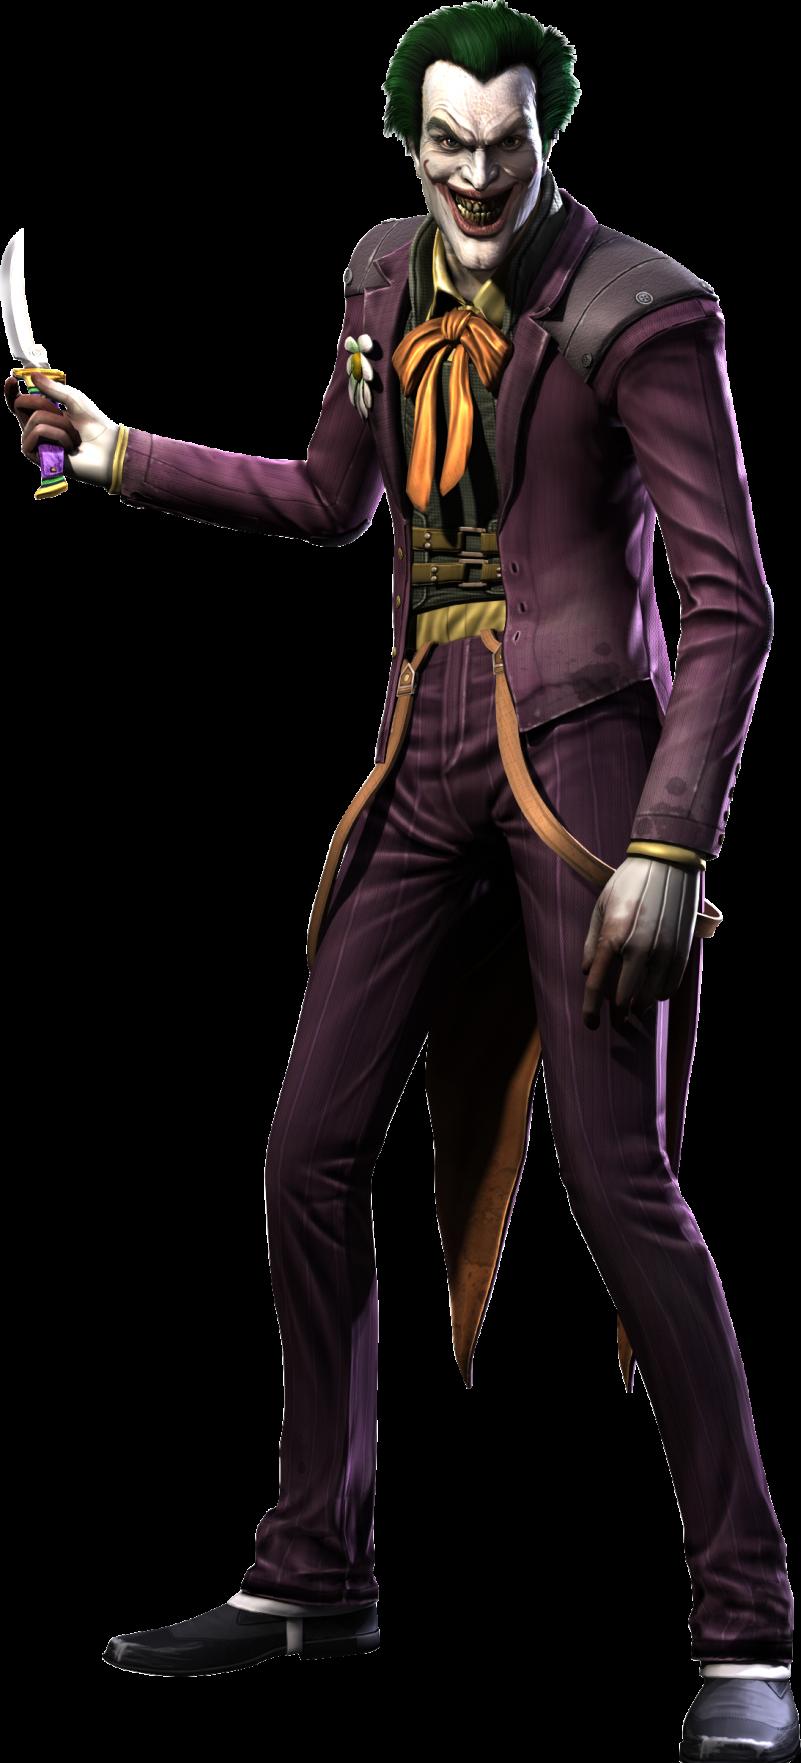 Joker Batman PNG Image